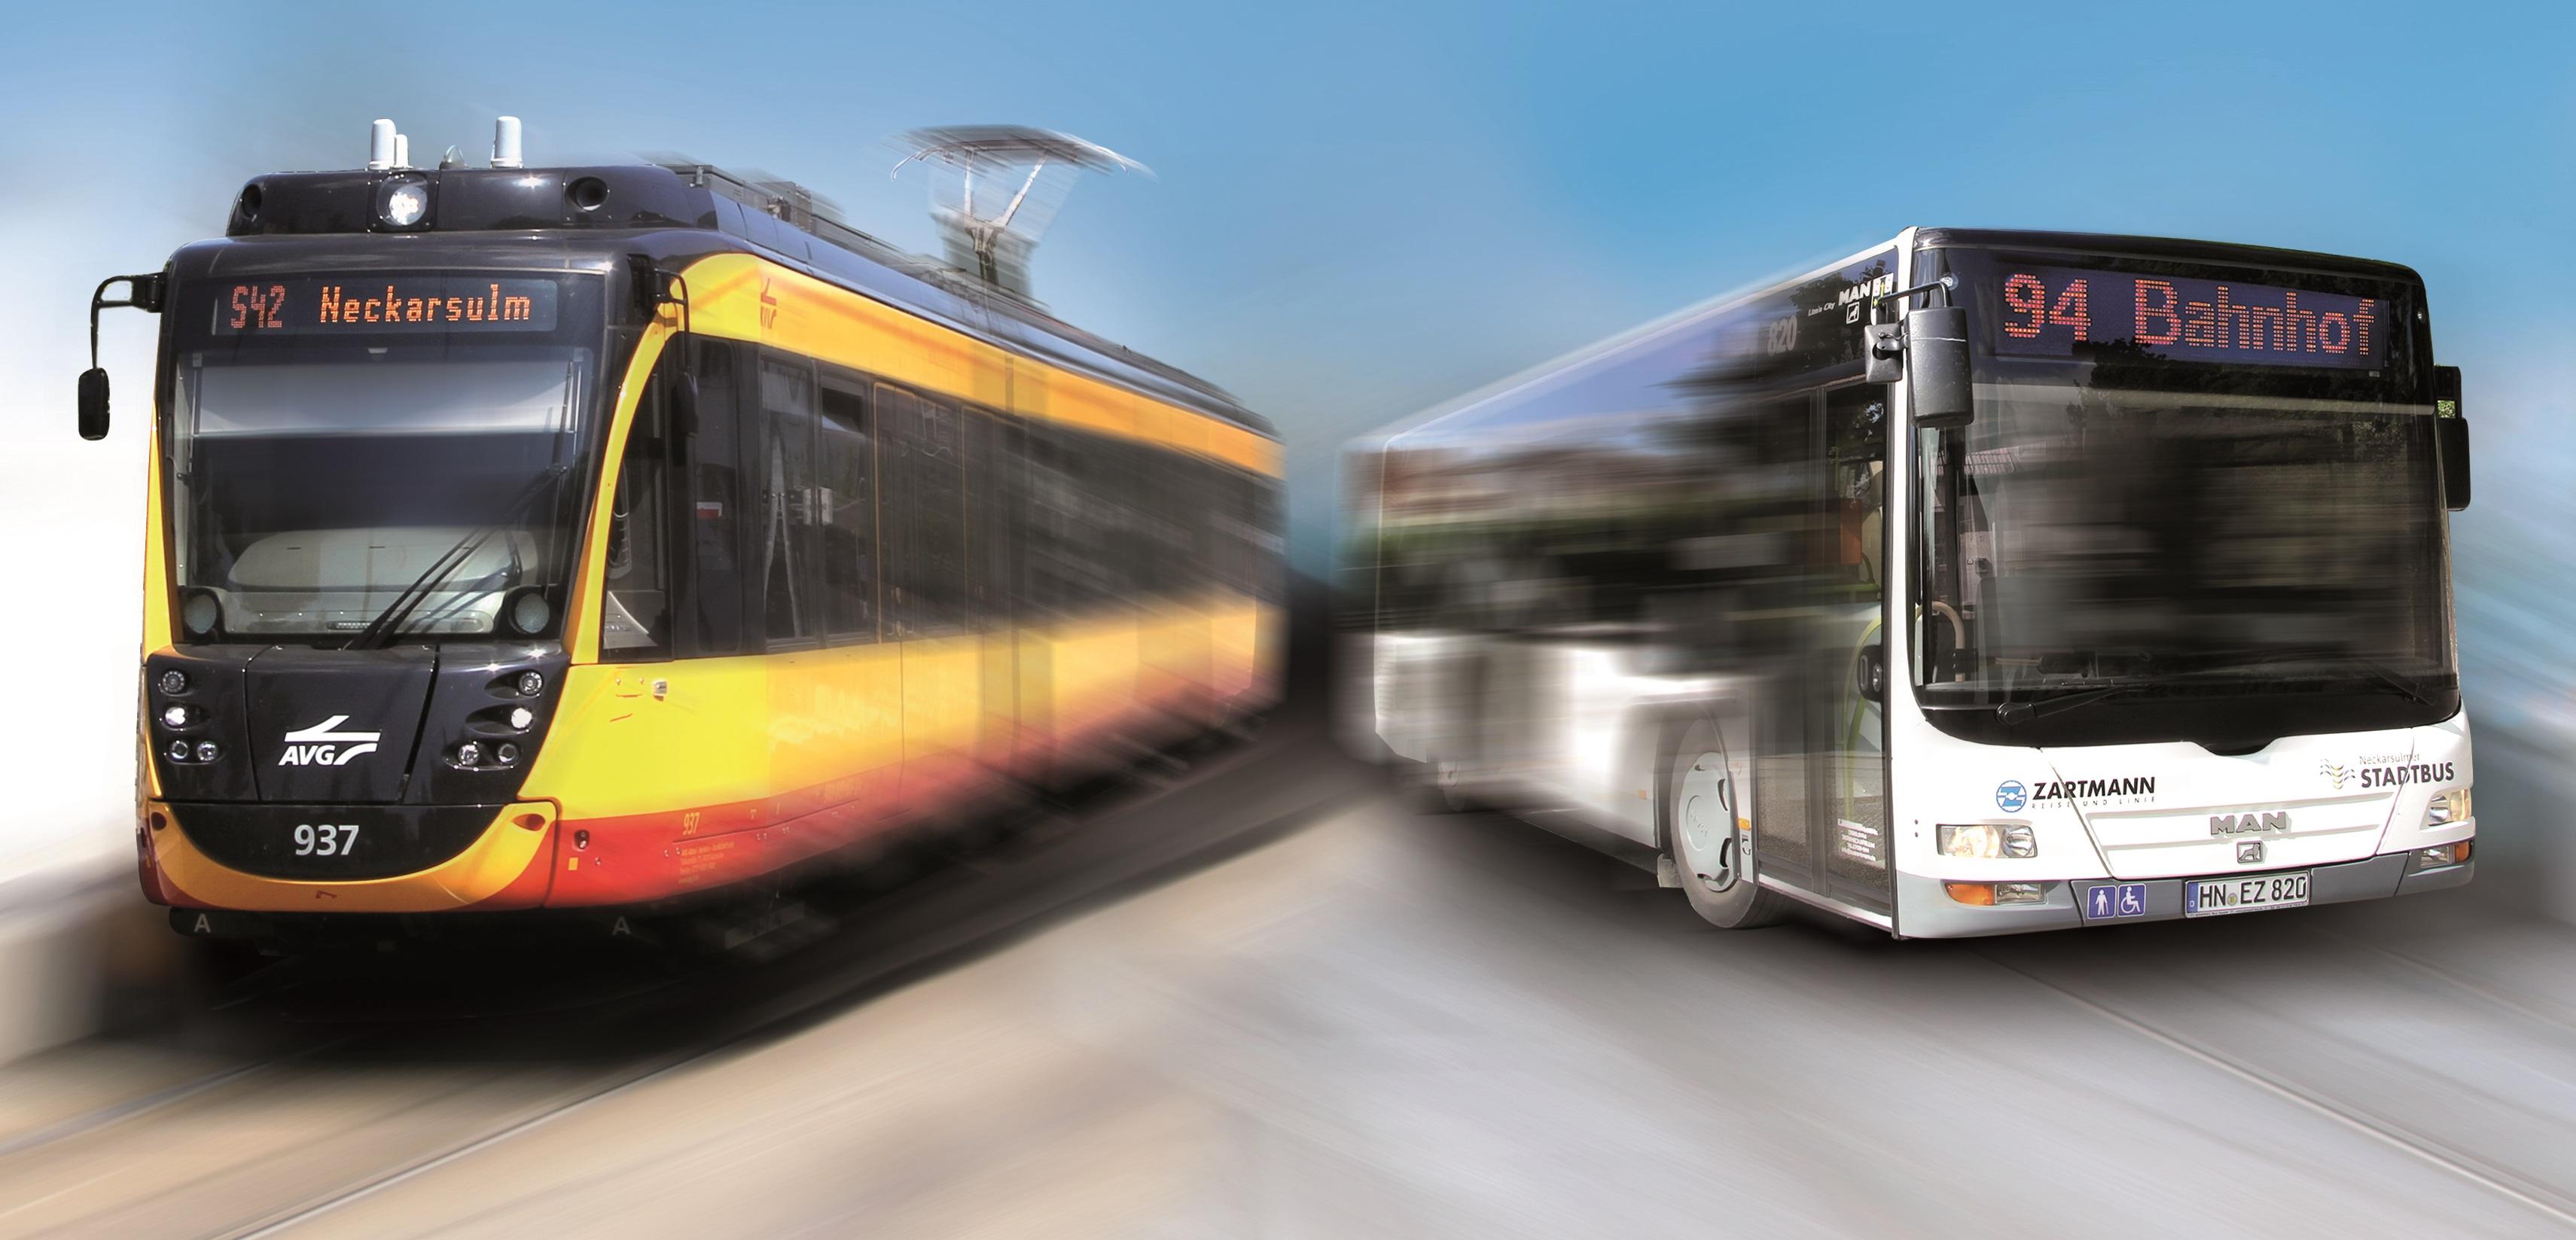 Bild-Stadtbahn+StadtbusVar2